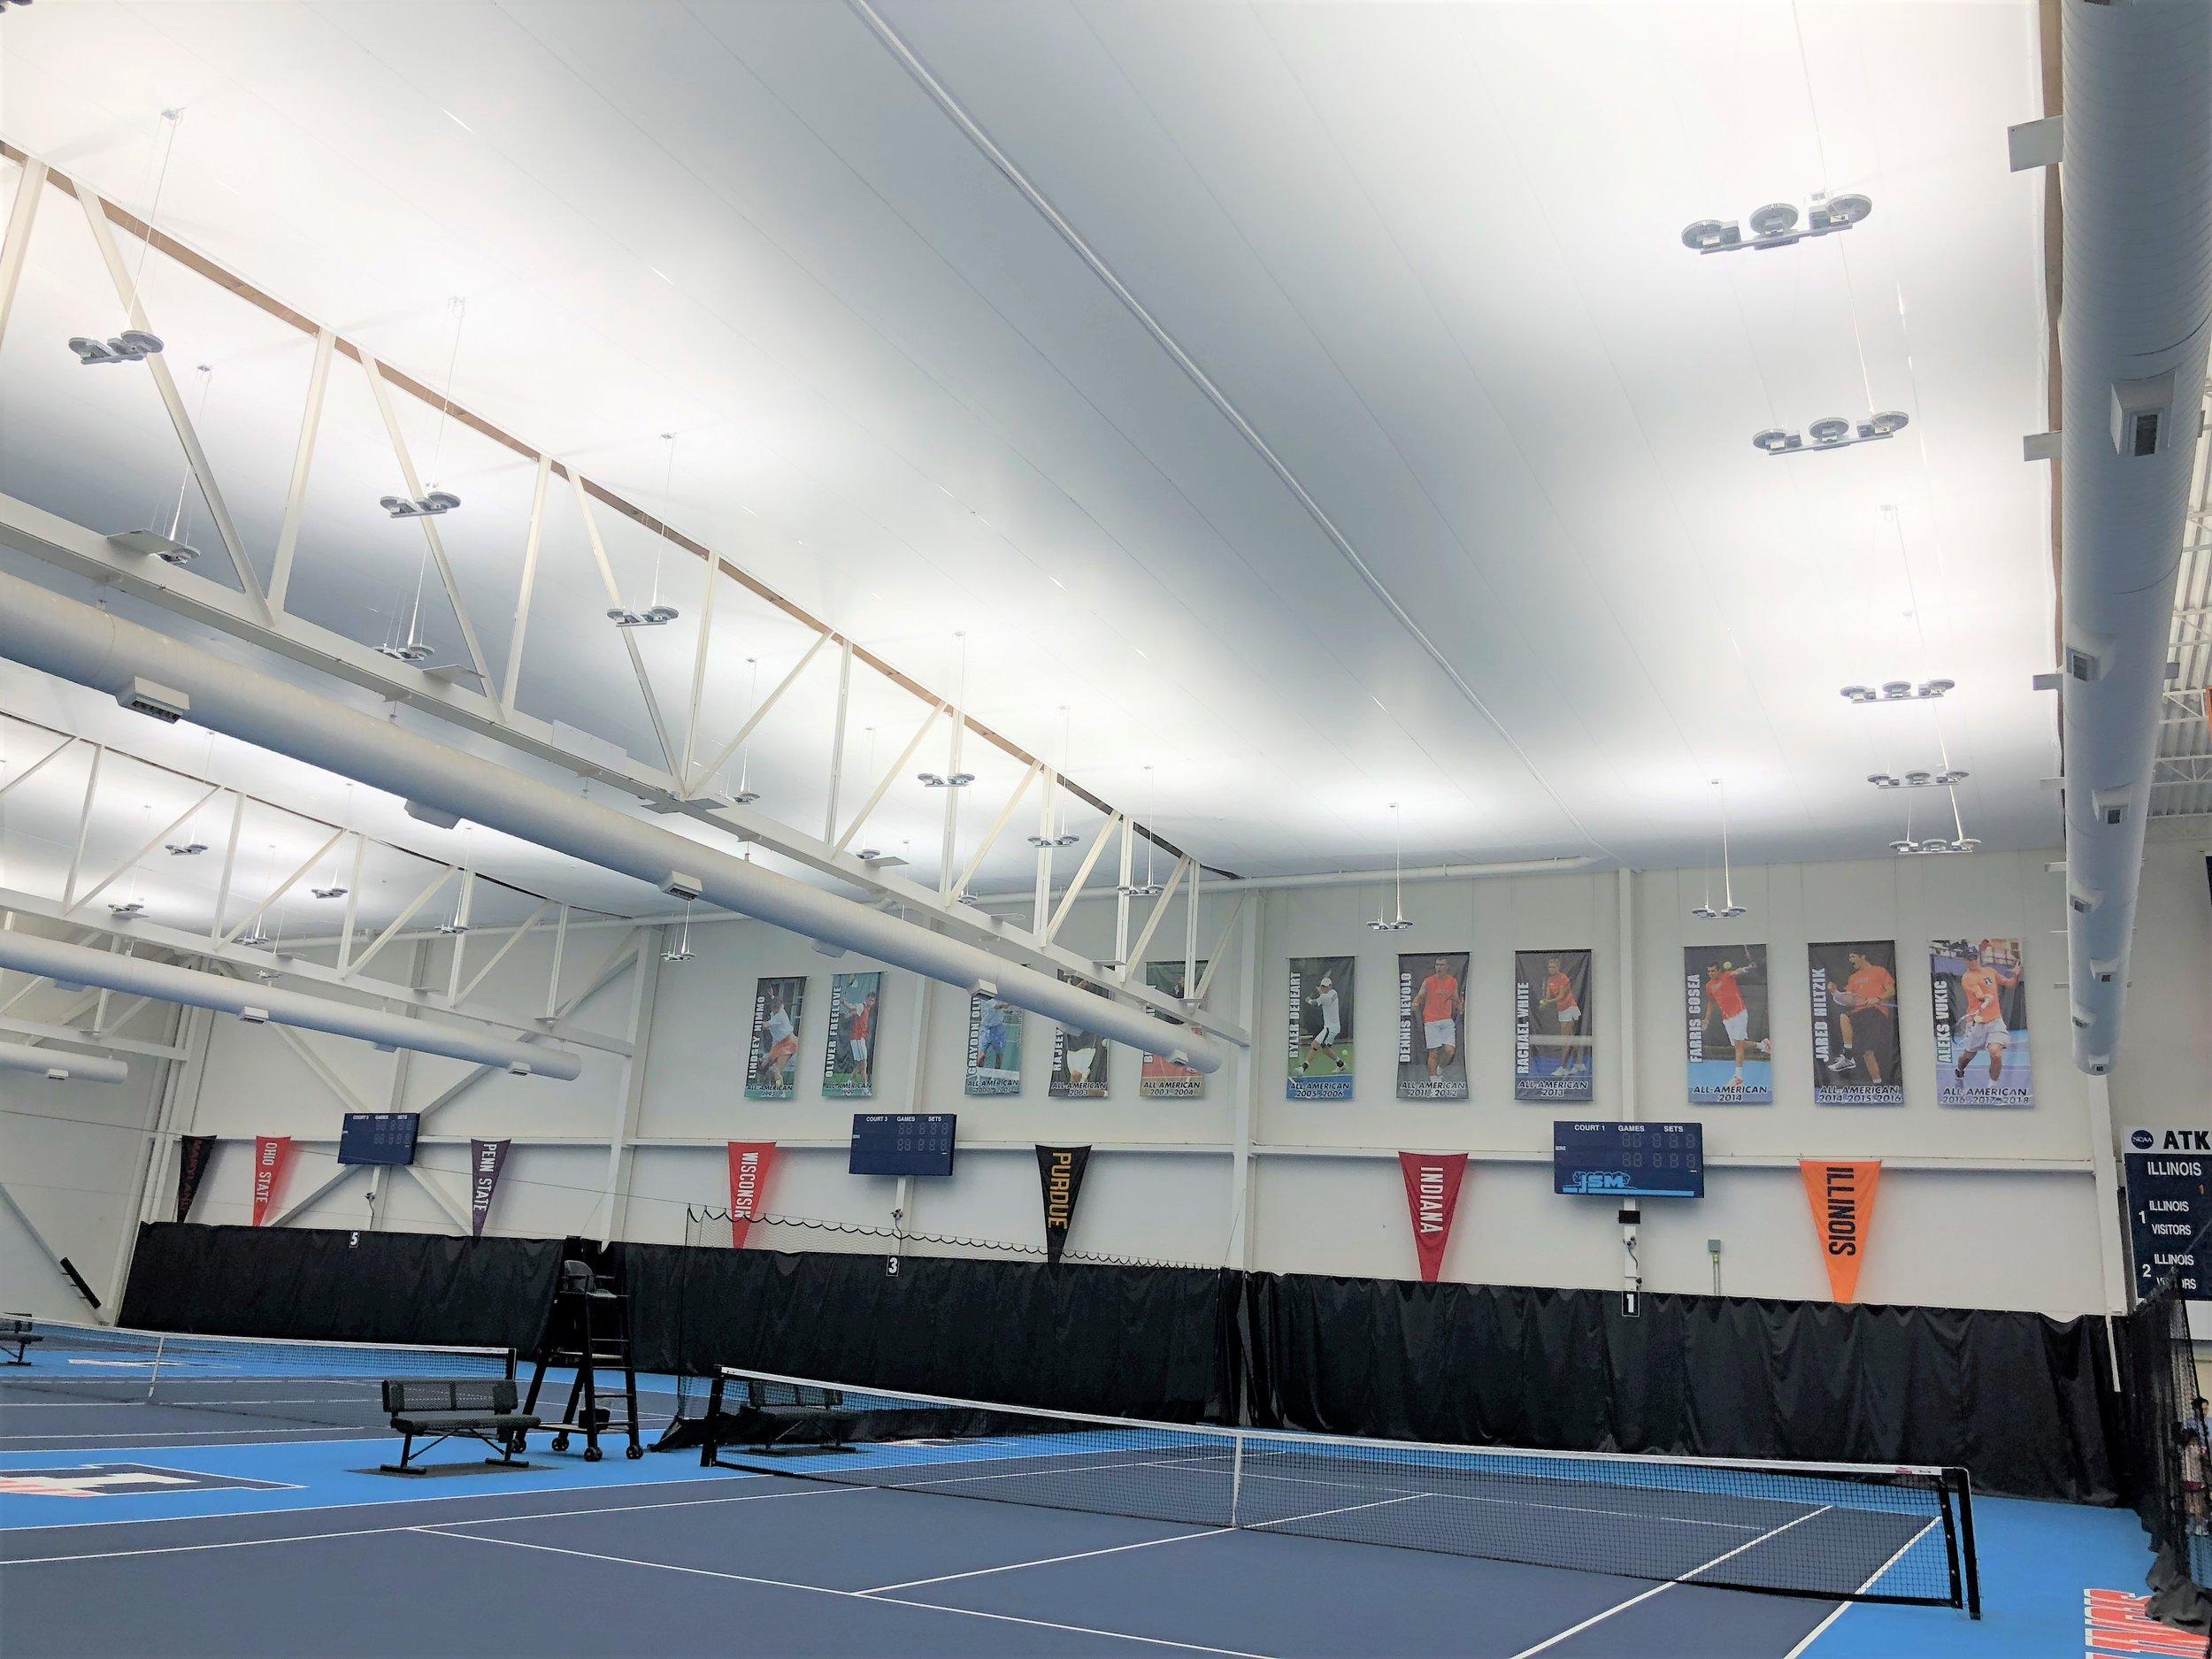 Univ of IL - Atkins Tennis Center.jpg